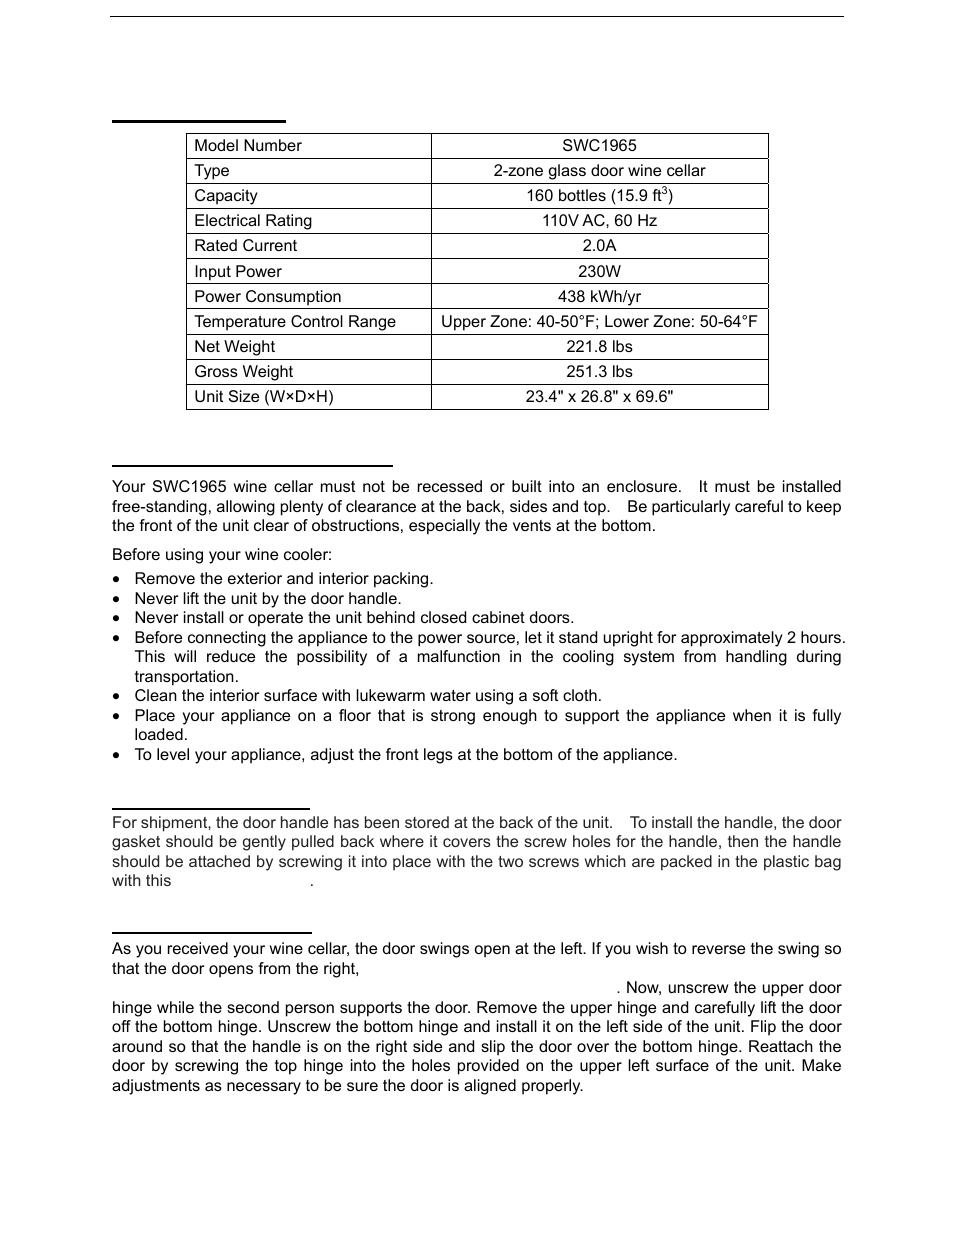 canon zr40 manual ebook on